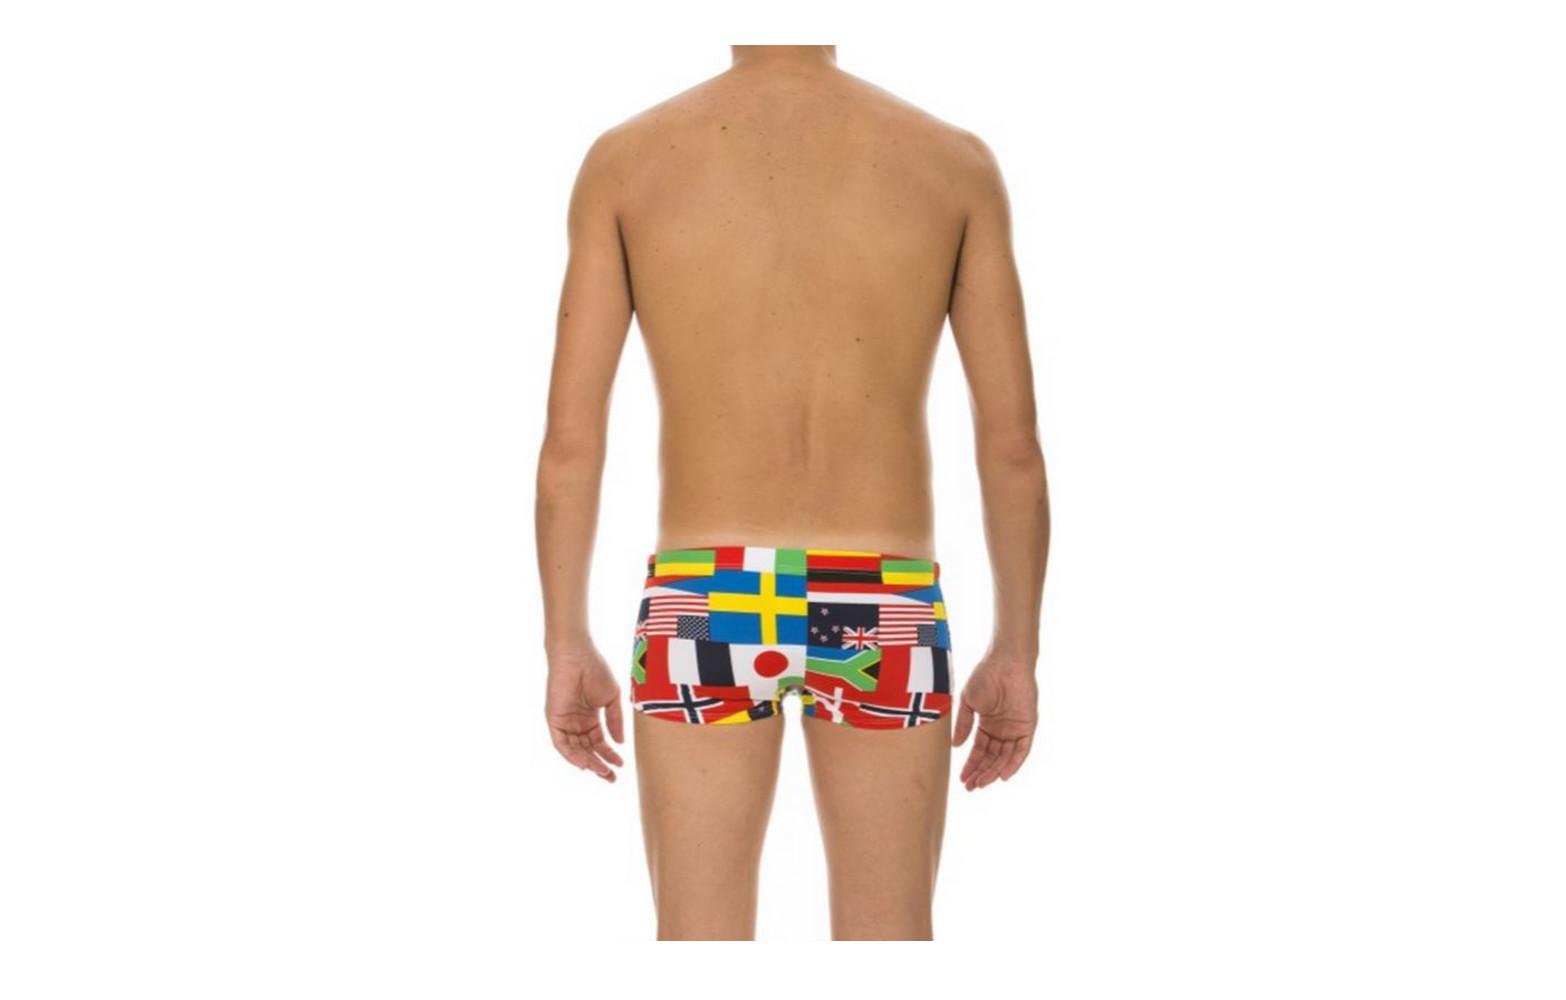 arena maillot de bain homme flags low waist short black. Black Bedroom Furniture Sets. Home Design Ideas